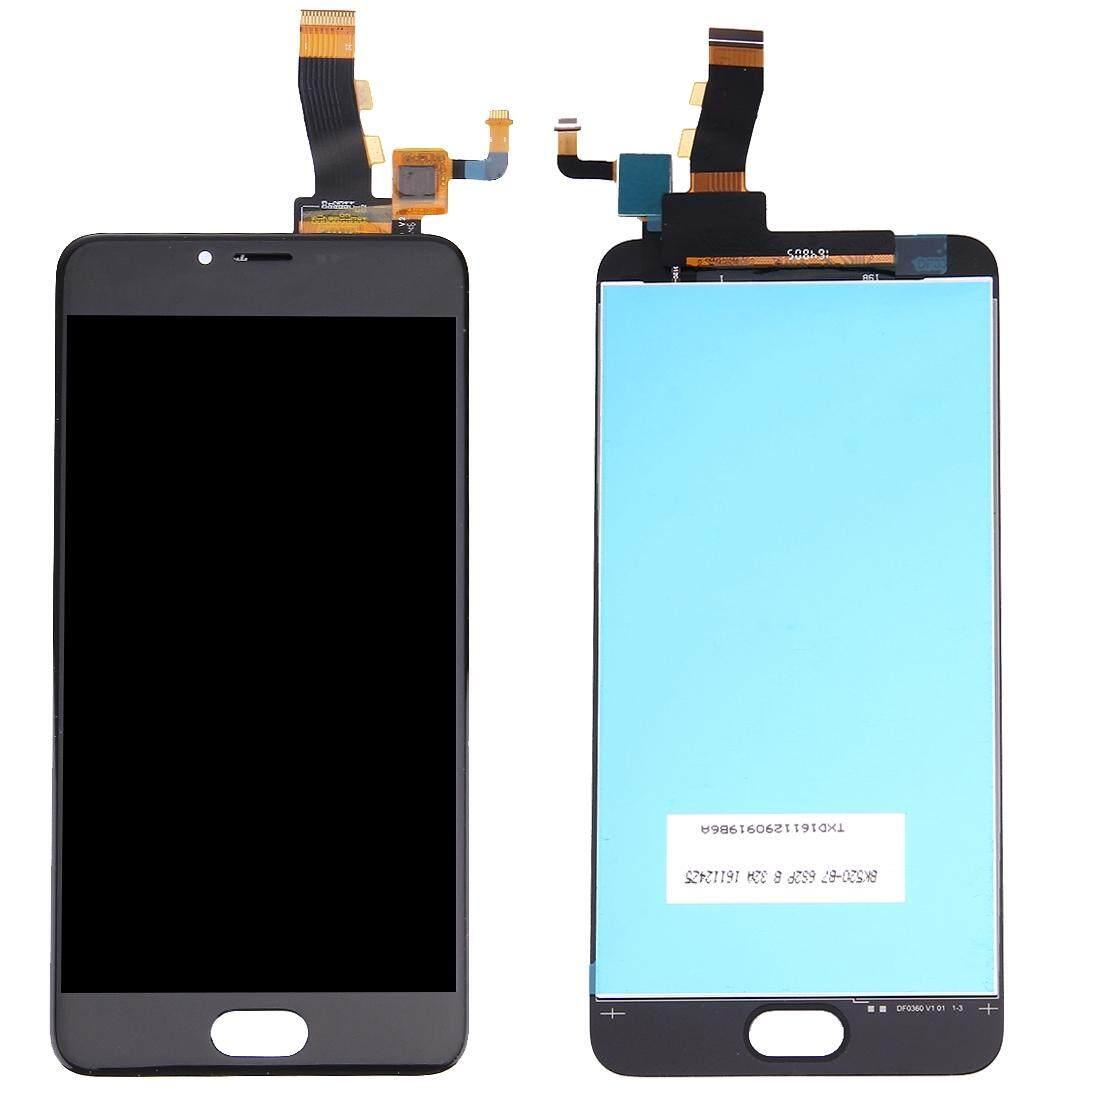 Meizu M5/Meilan 5 Layar LCD dan Digitizer Penuh Perakitan (Hitam)